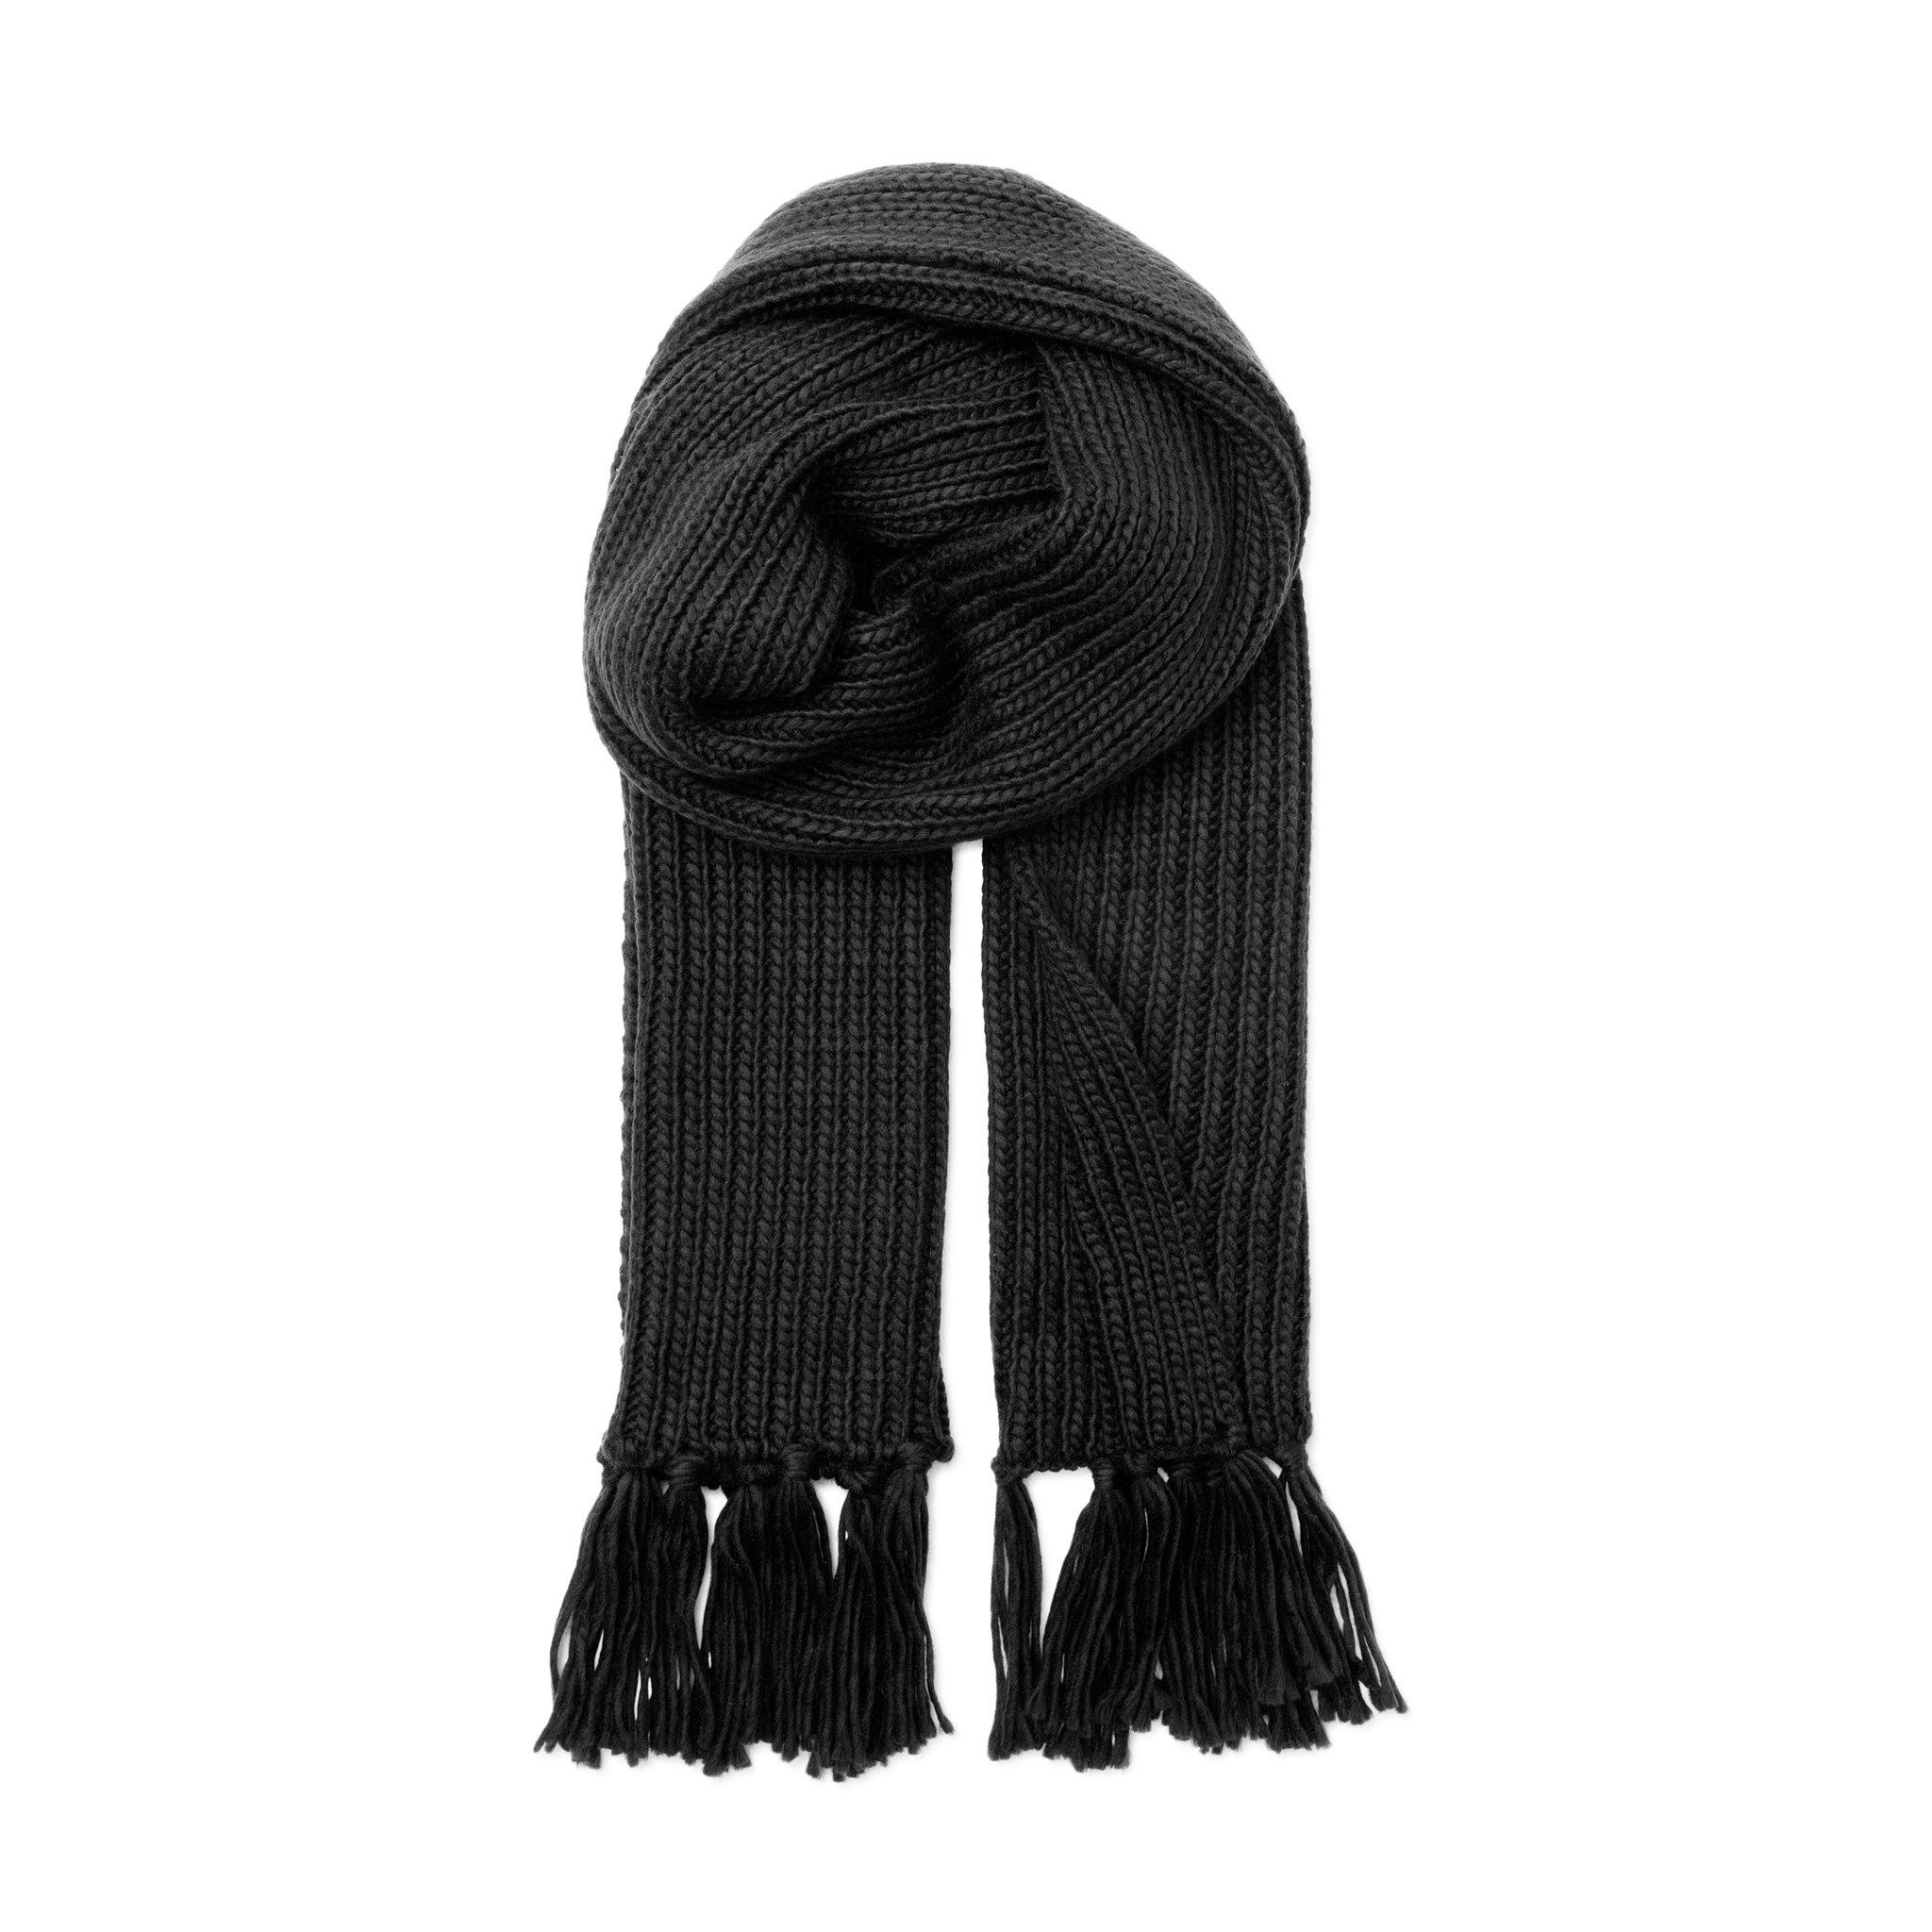 Halsduk med fransar - Halsdukar   scarves - Köp online på åhlens.se! f8b3f1d941446